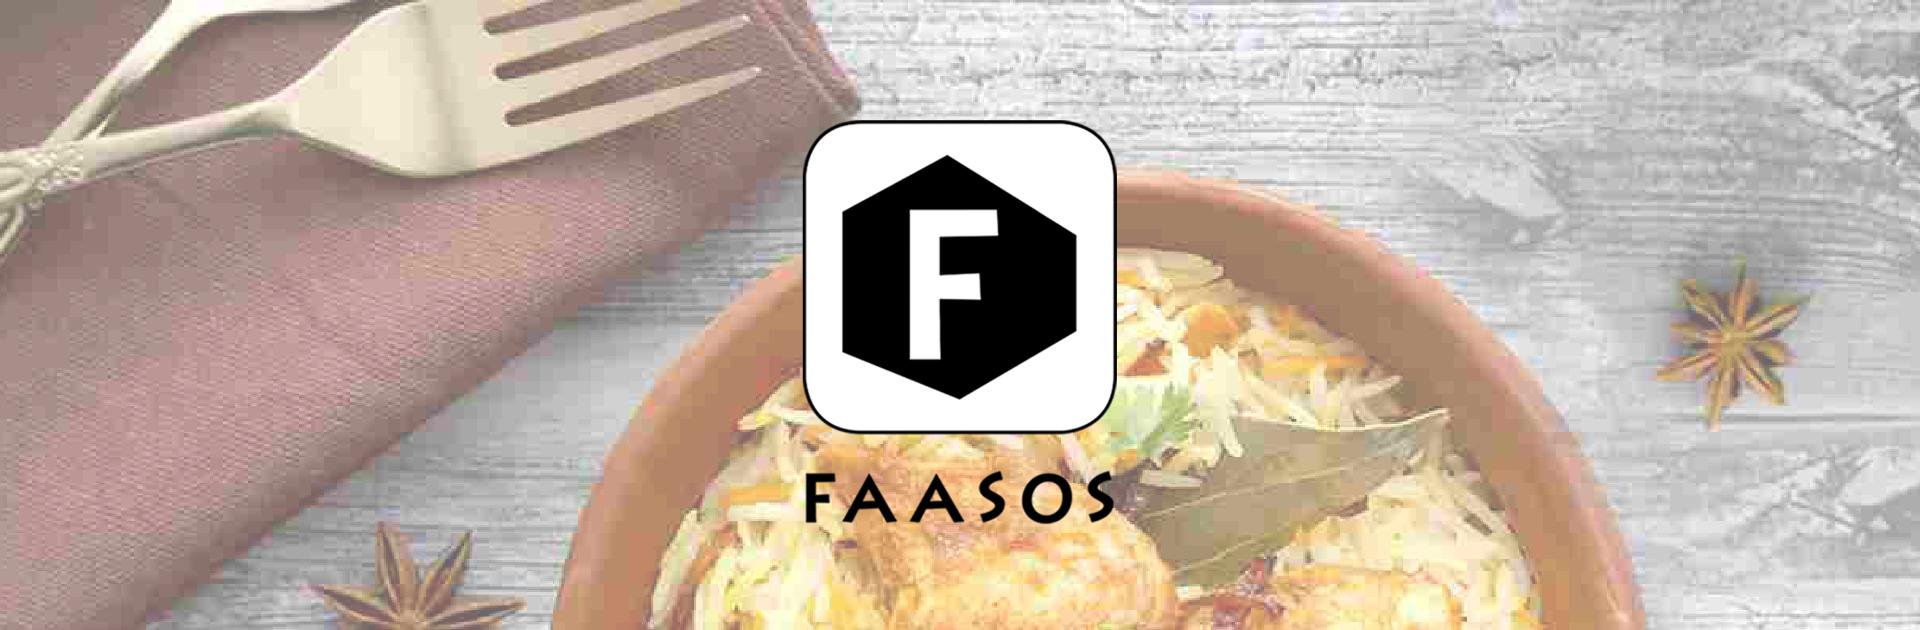 faasos_banner